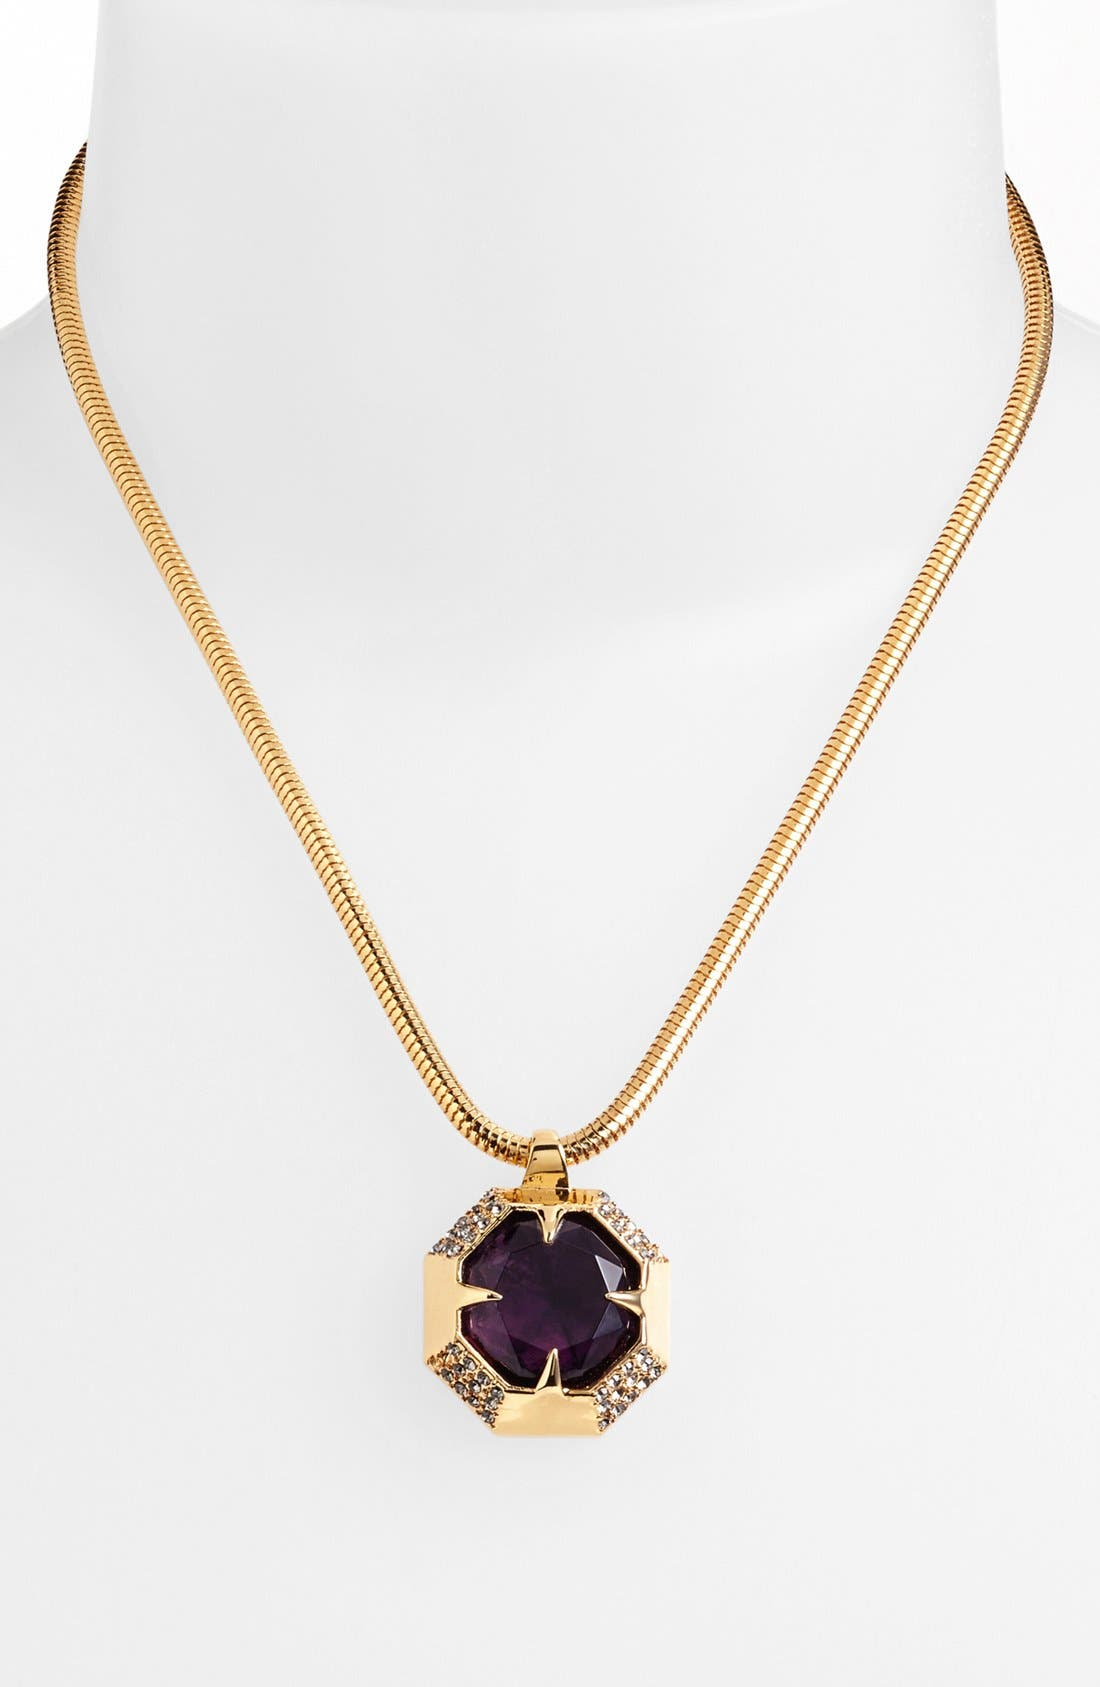 Main Image - Vince Camuto 'Jewel Purpose' Stone Pendant Necklace